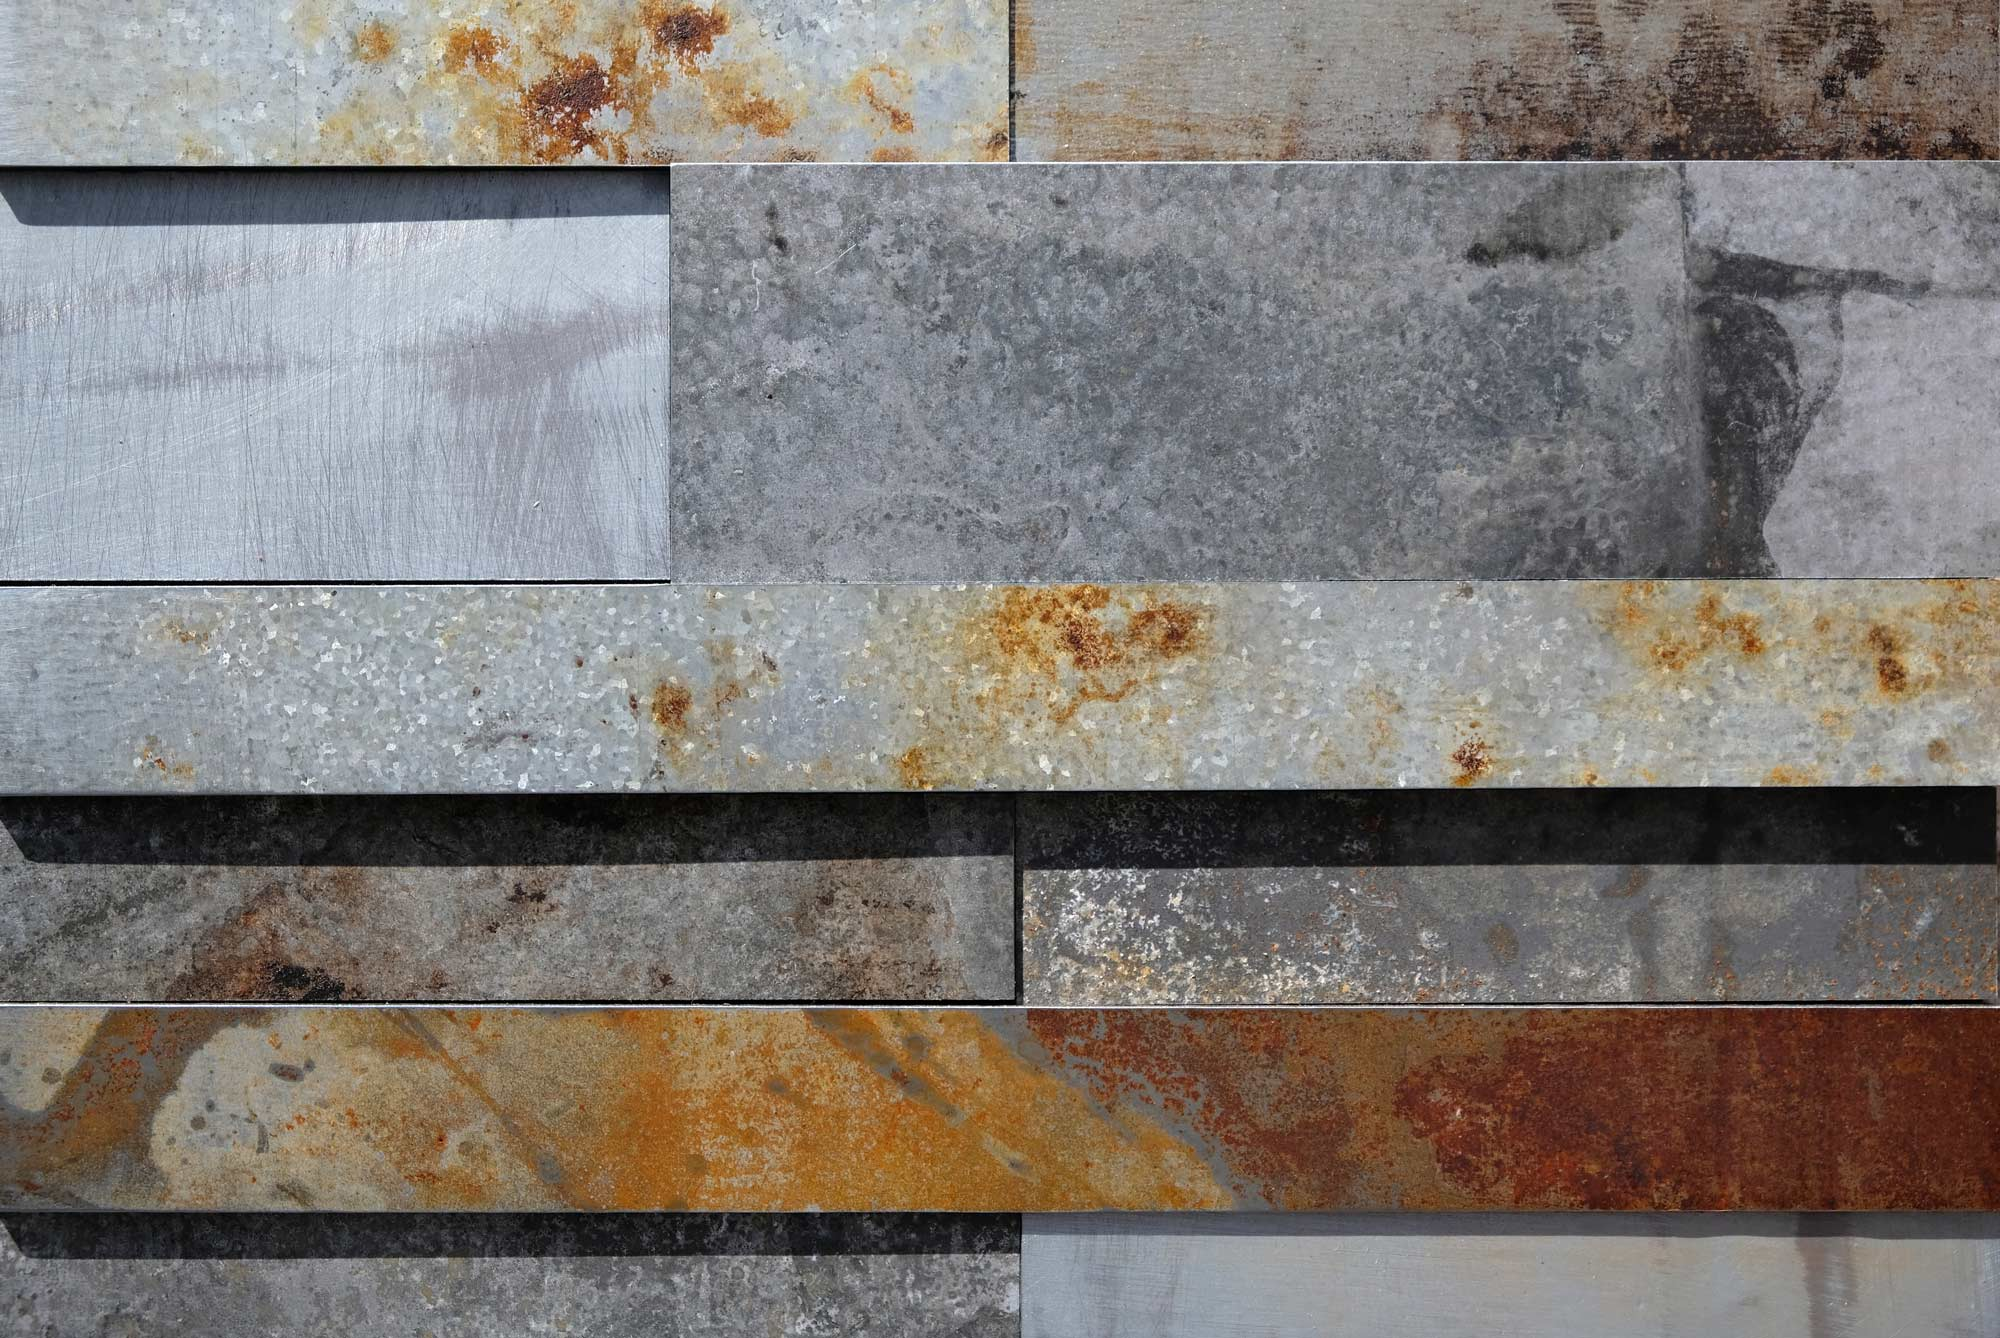 wandpaneele-metall-zink-oxidiert-gut-gezinkt-silber-rost